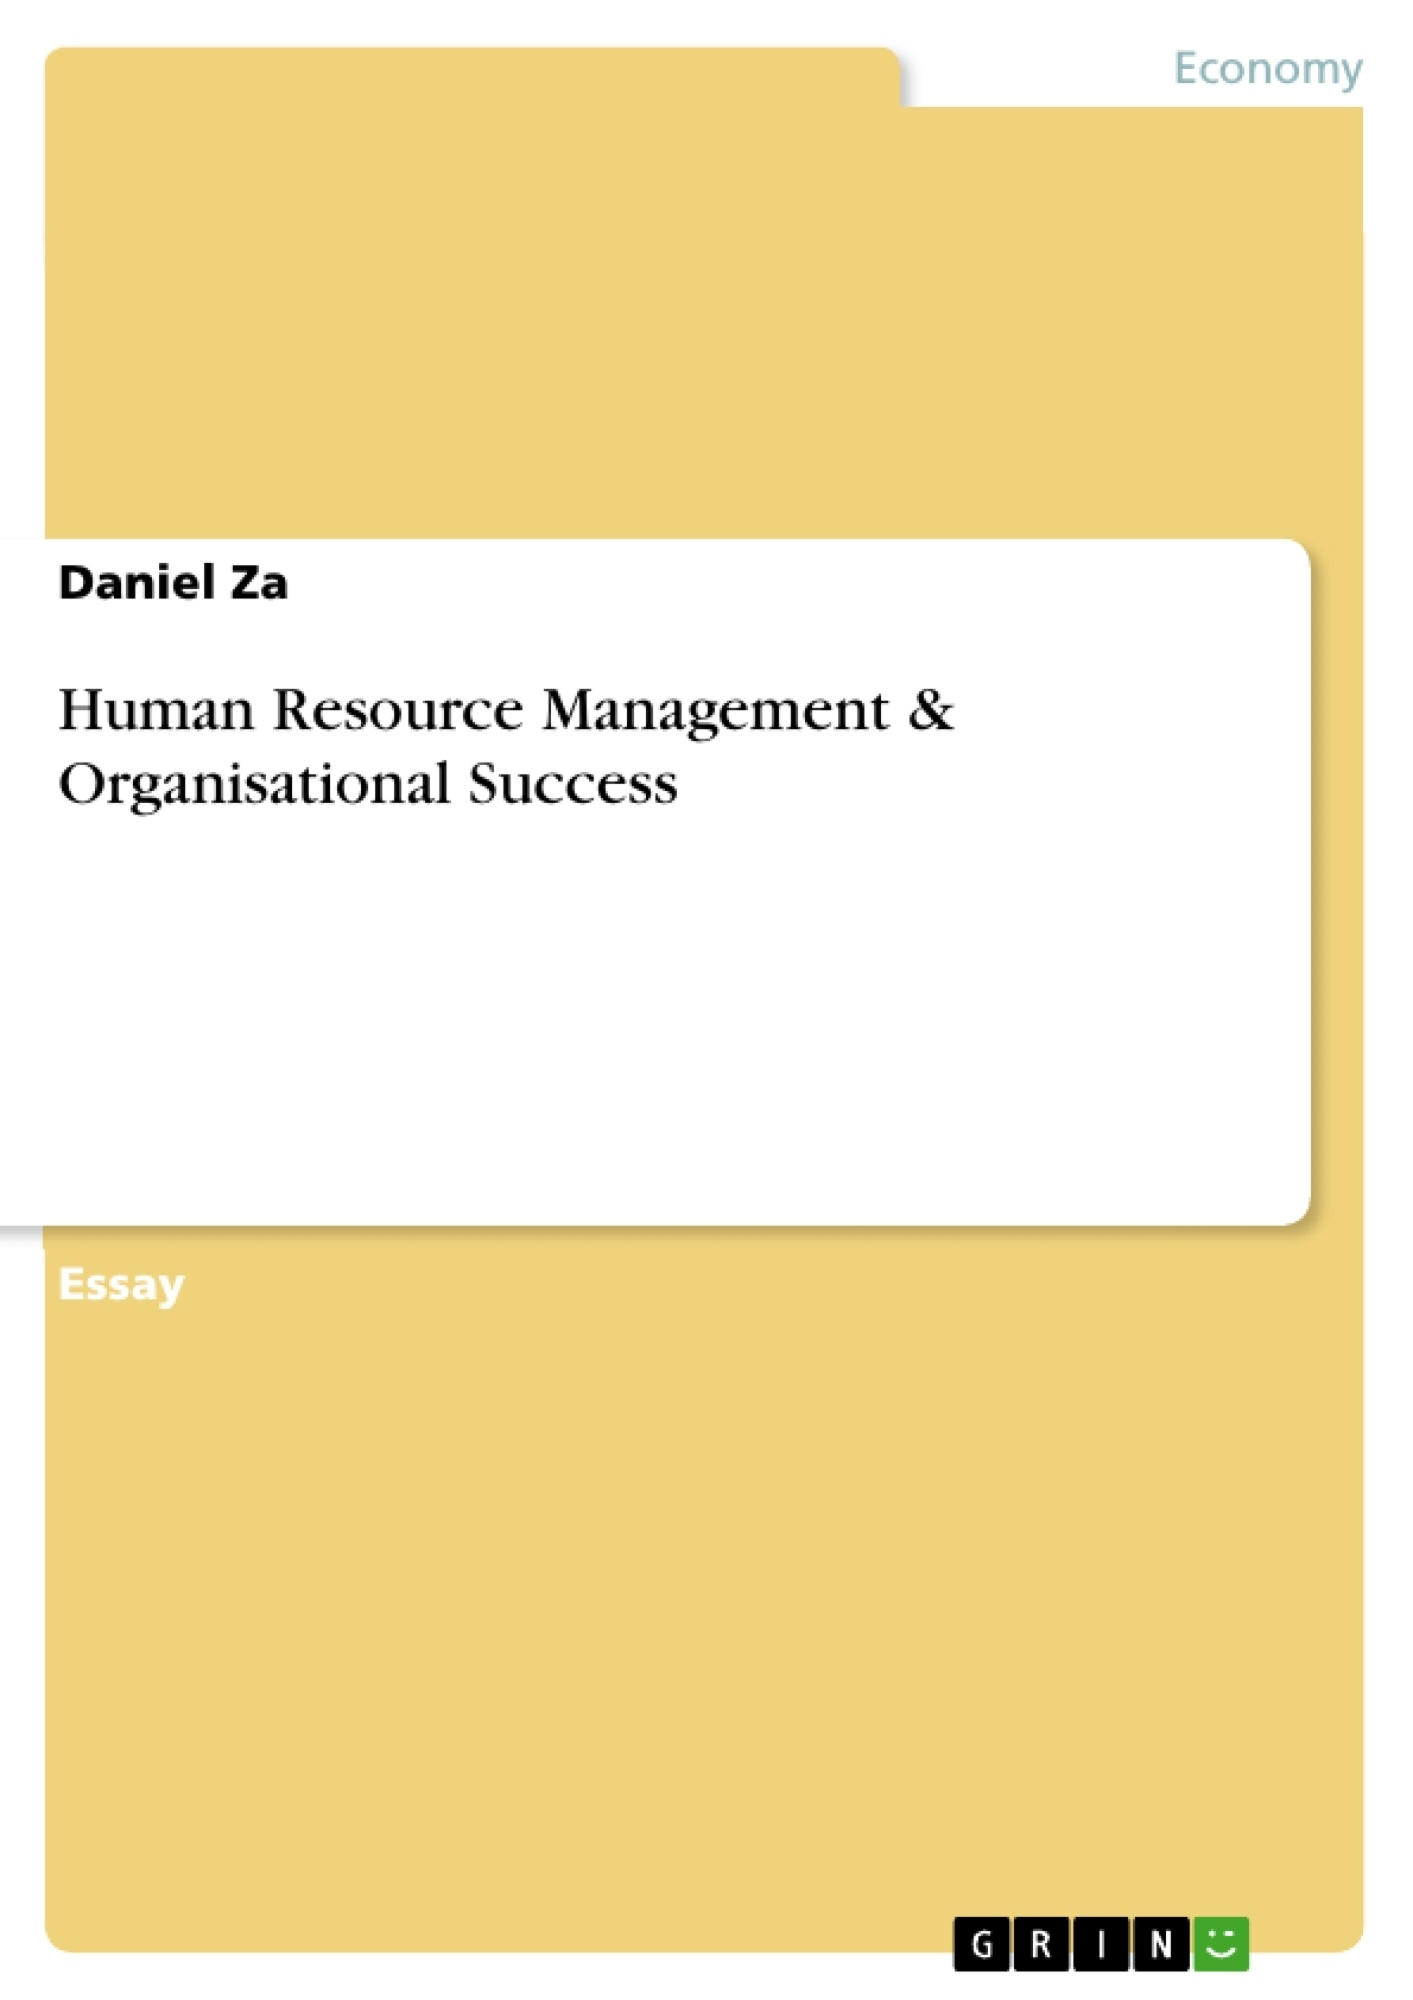 Title: Human Resource Management & Organisational Success